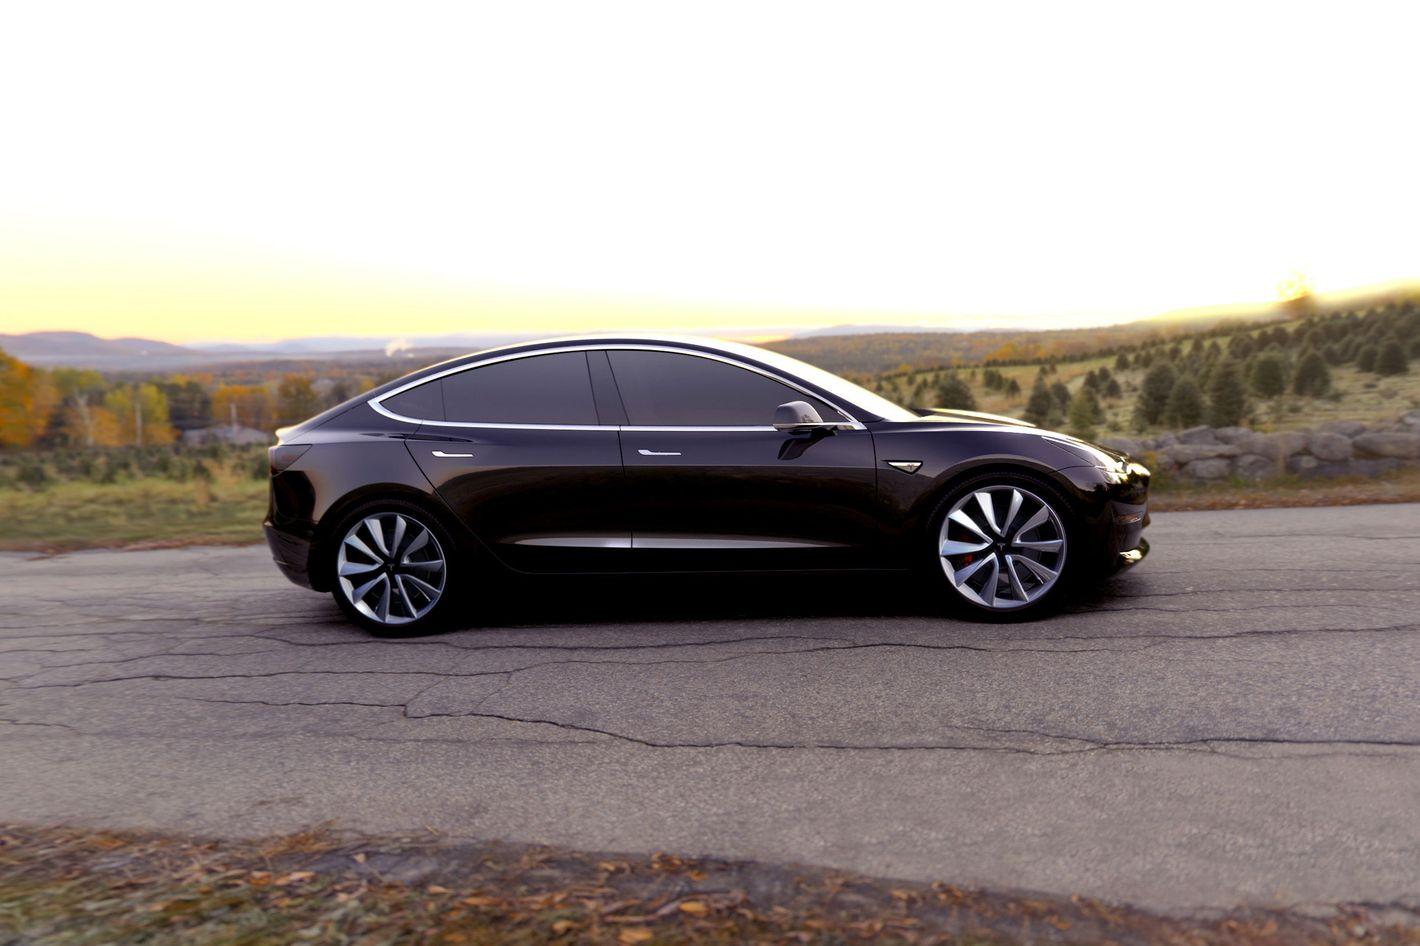 Elon Musk Telsa Master Plan Tesla Motor Design Diagram Pics